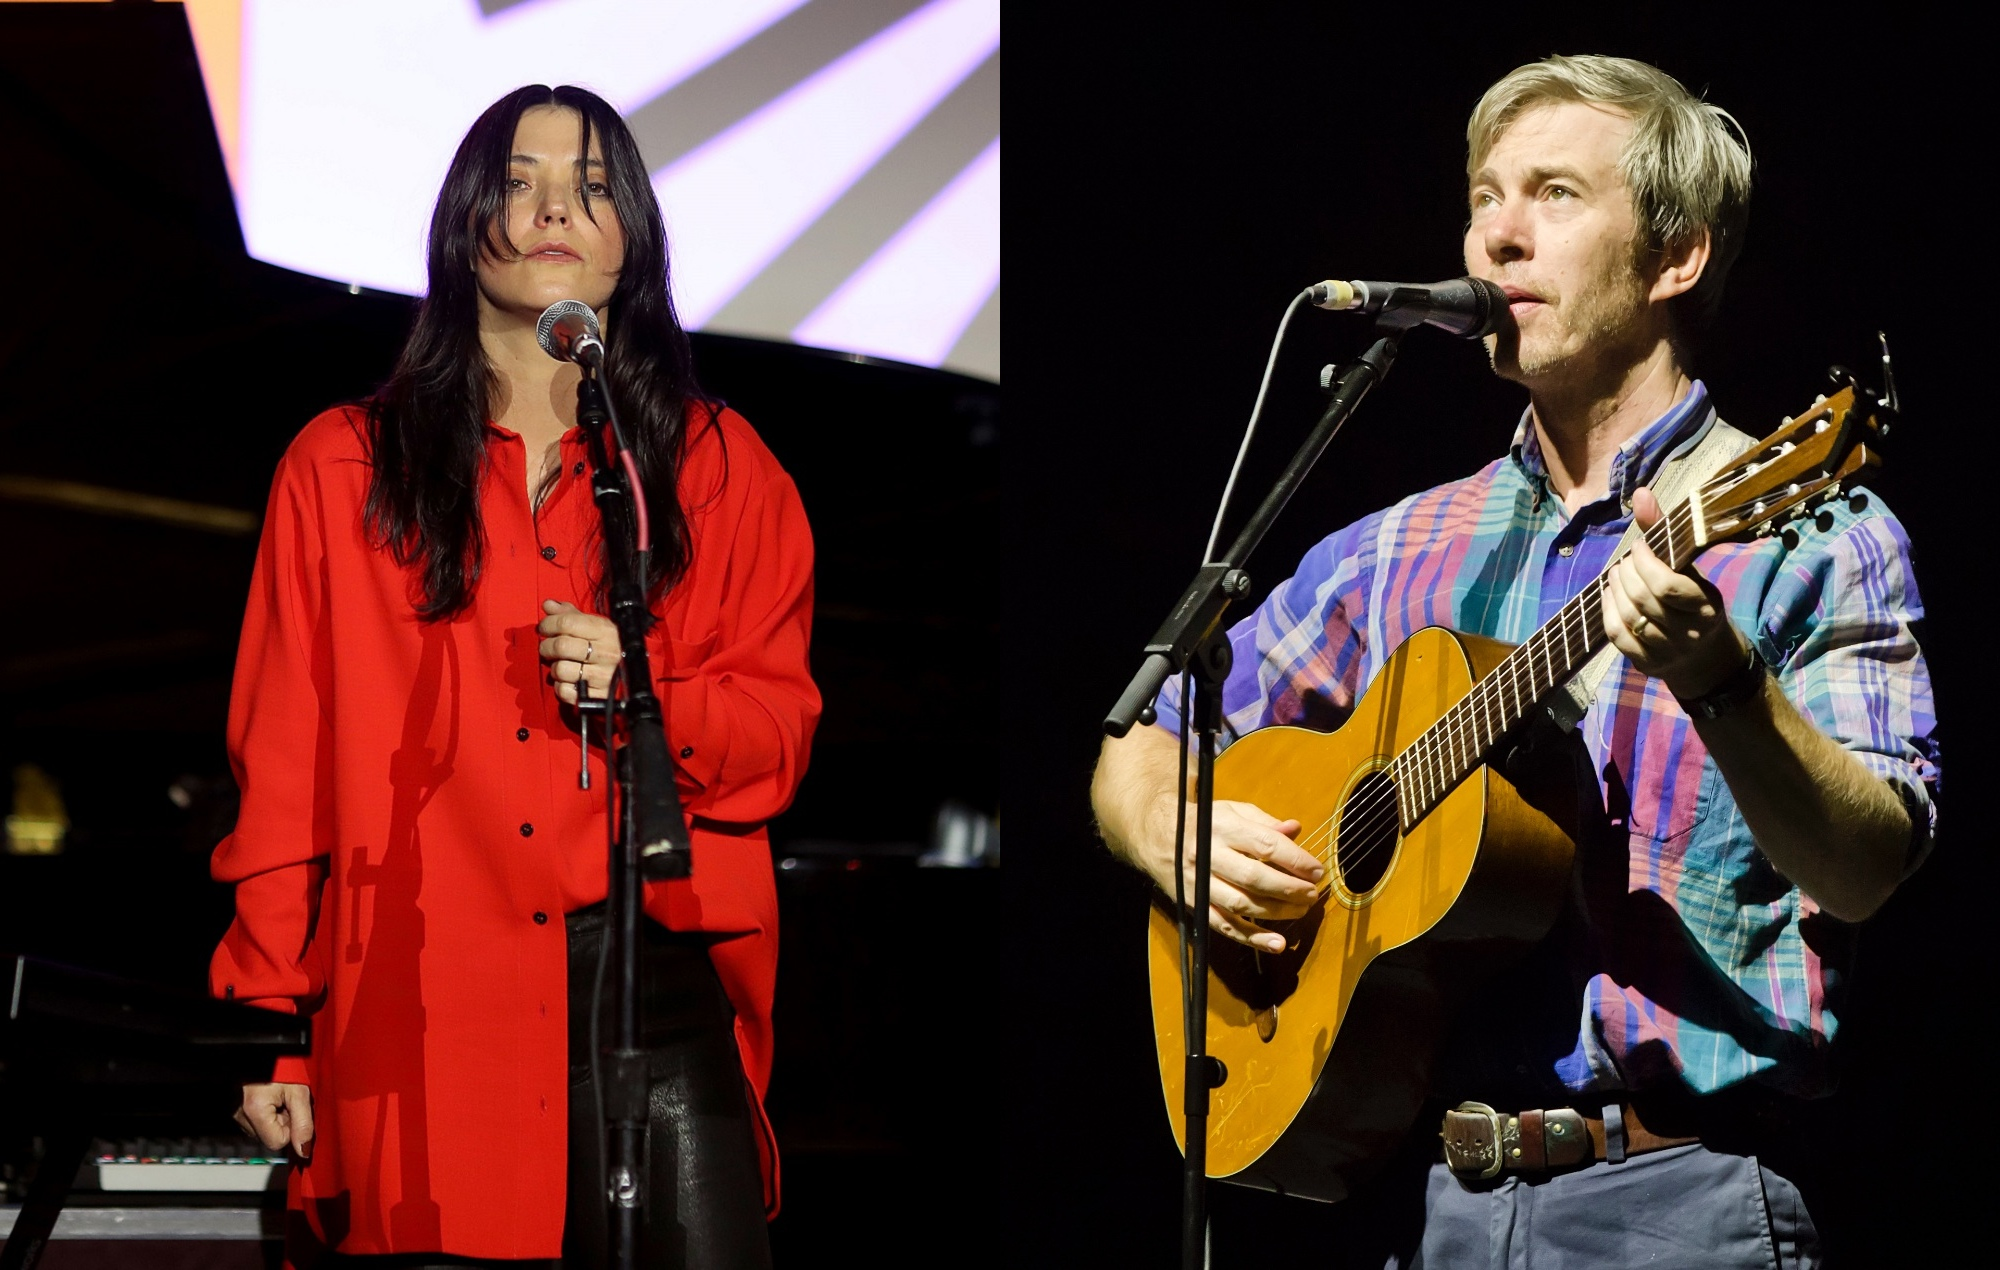 Sharon Van Etten, Bill Callahan and more to play Folk Medicine benefit livestream   NME